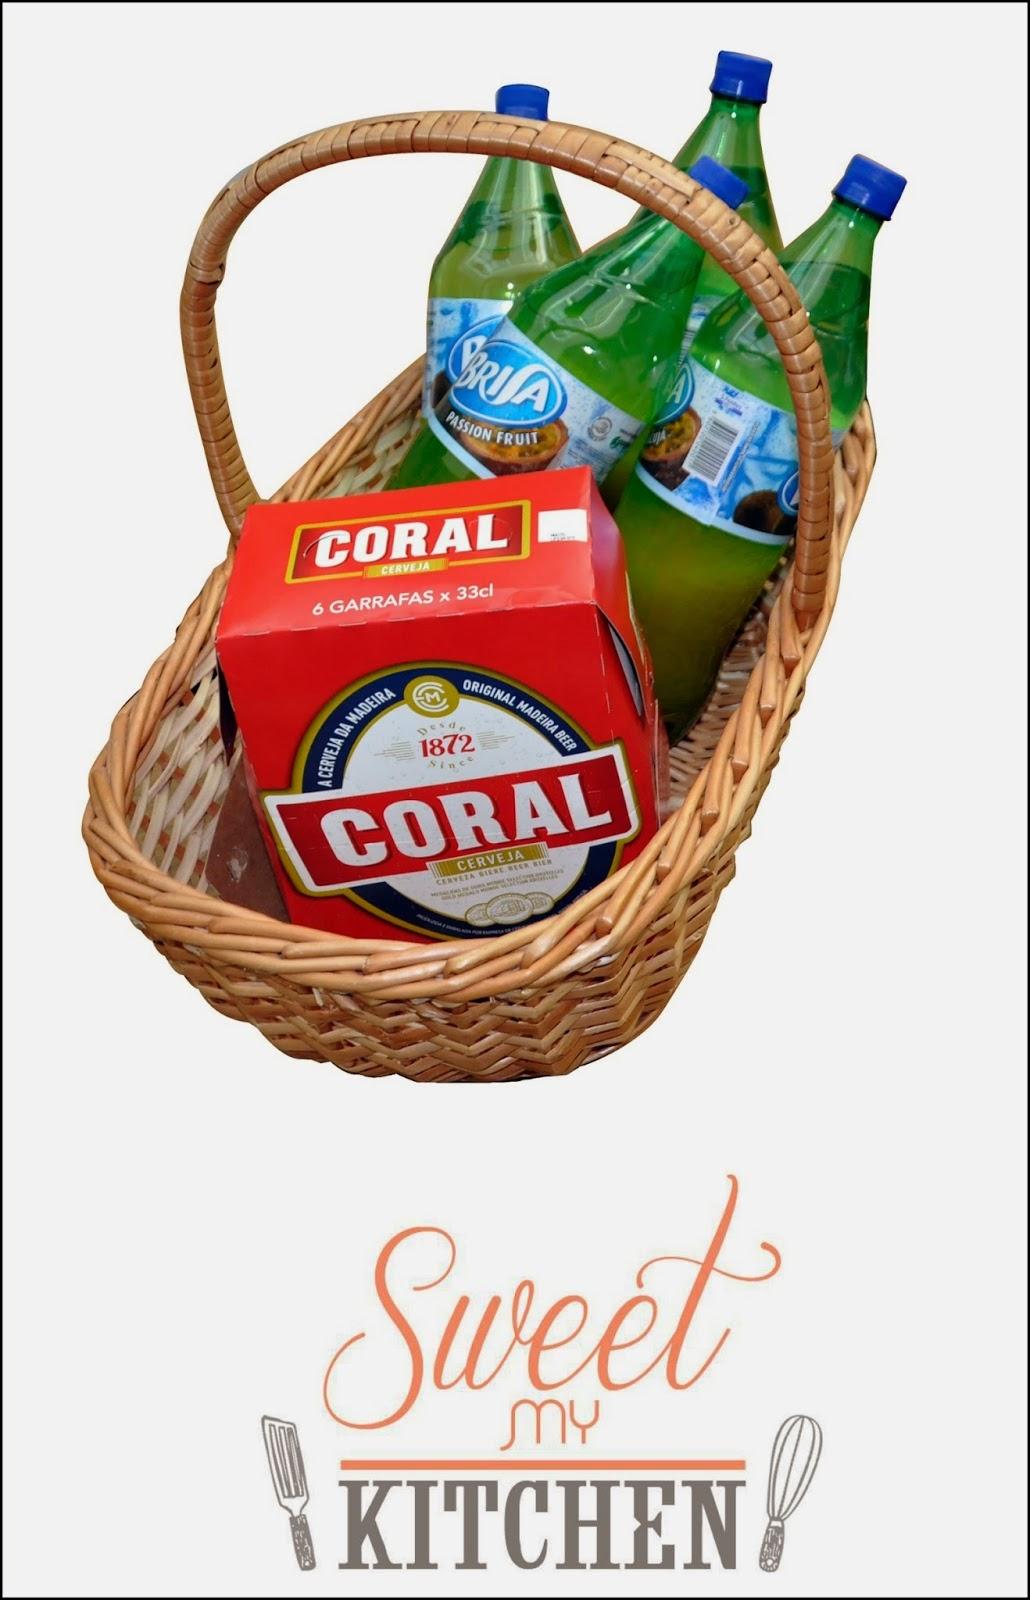 http://www.sweetmykitchen.com/2014/12/passatempo-cocktail-de-natal-com-brisa.html